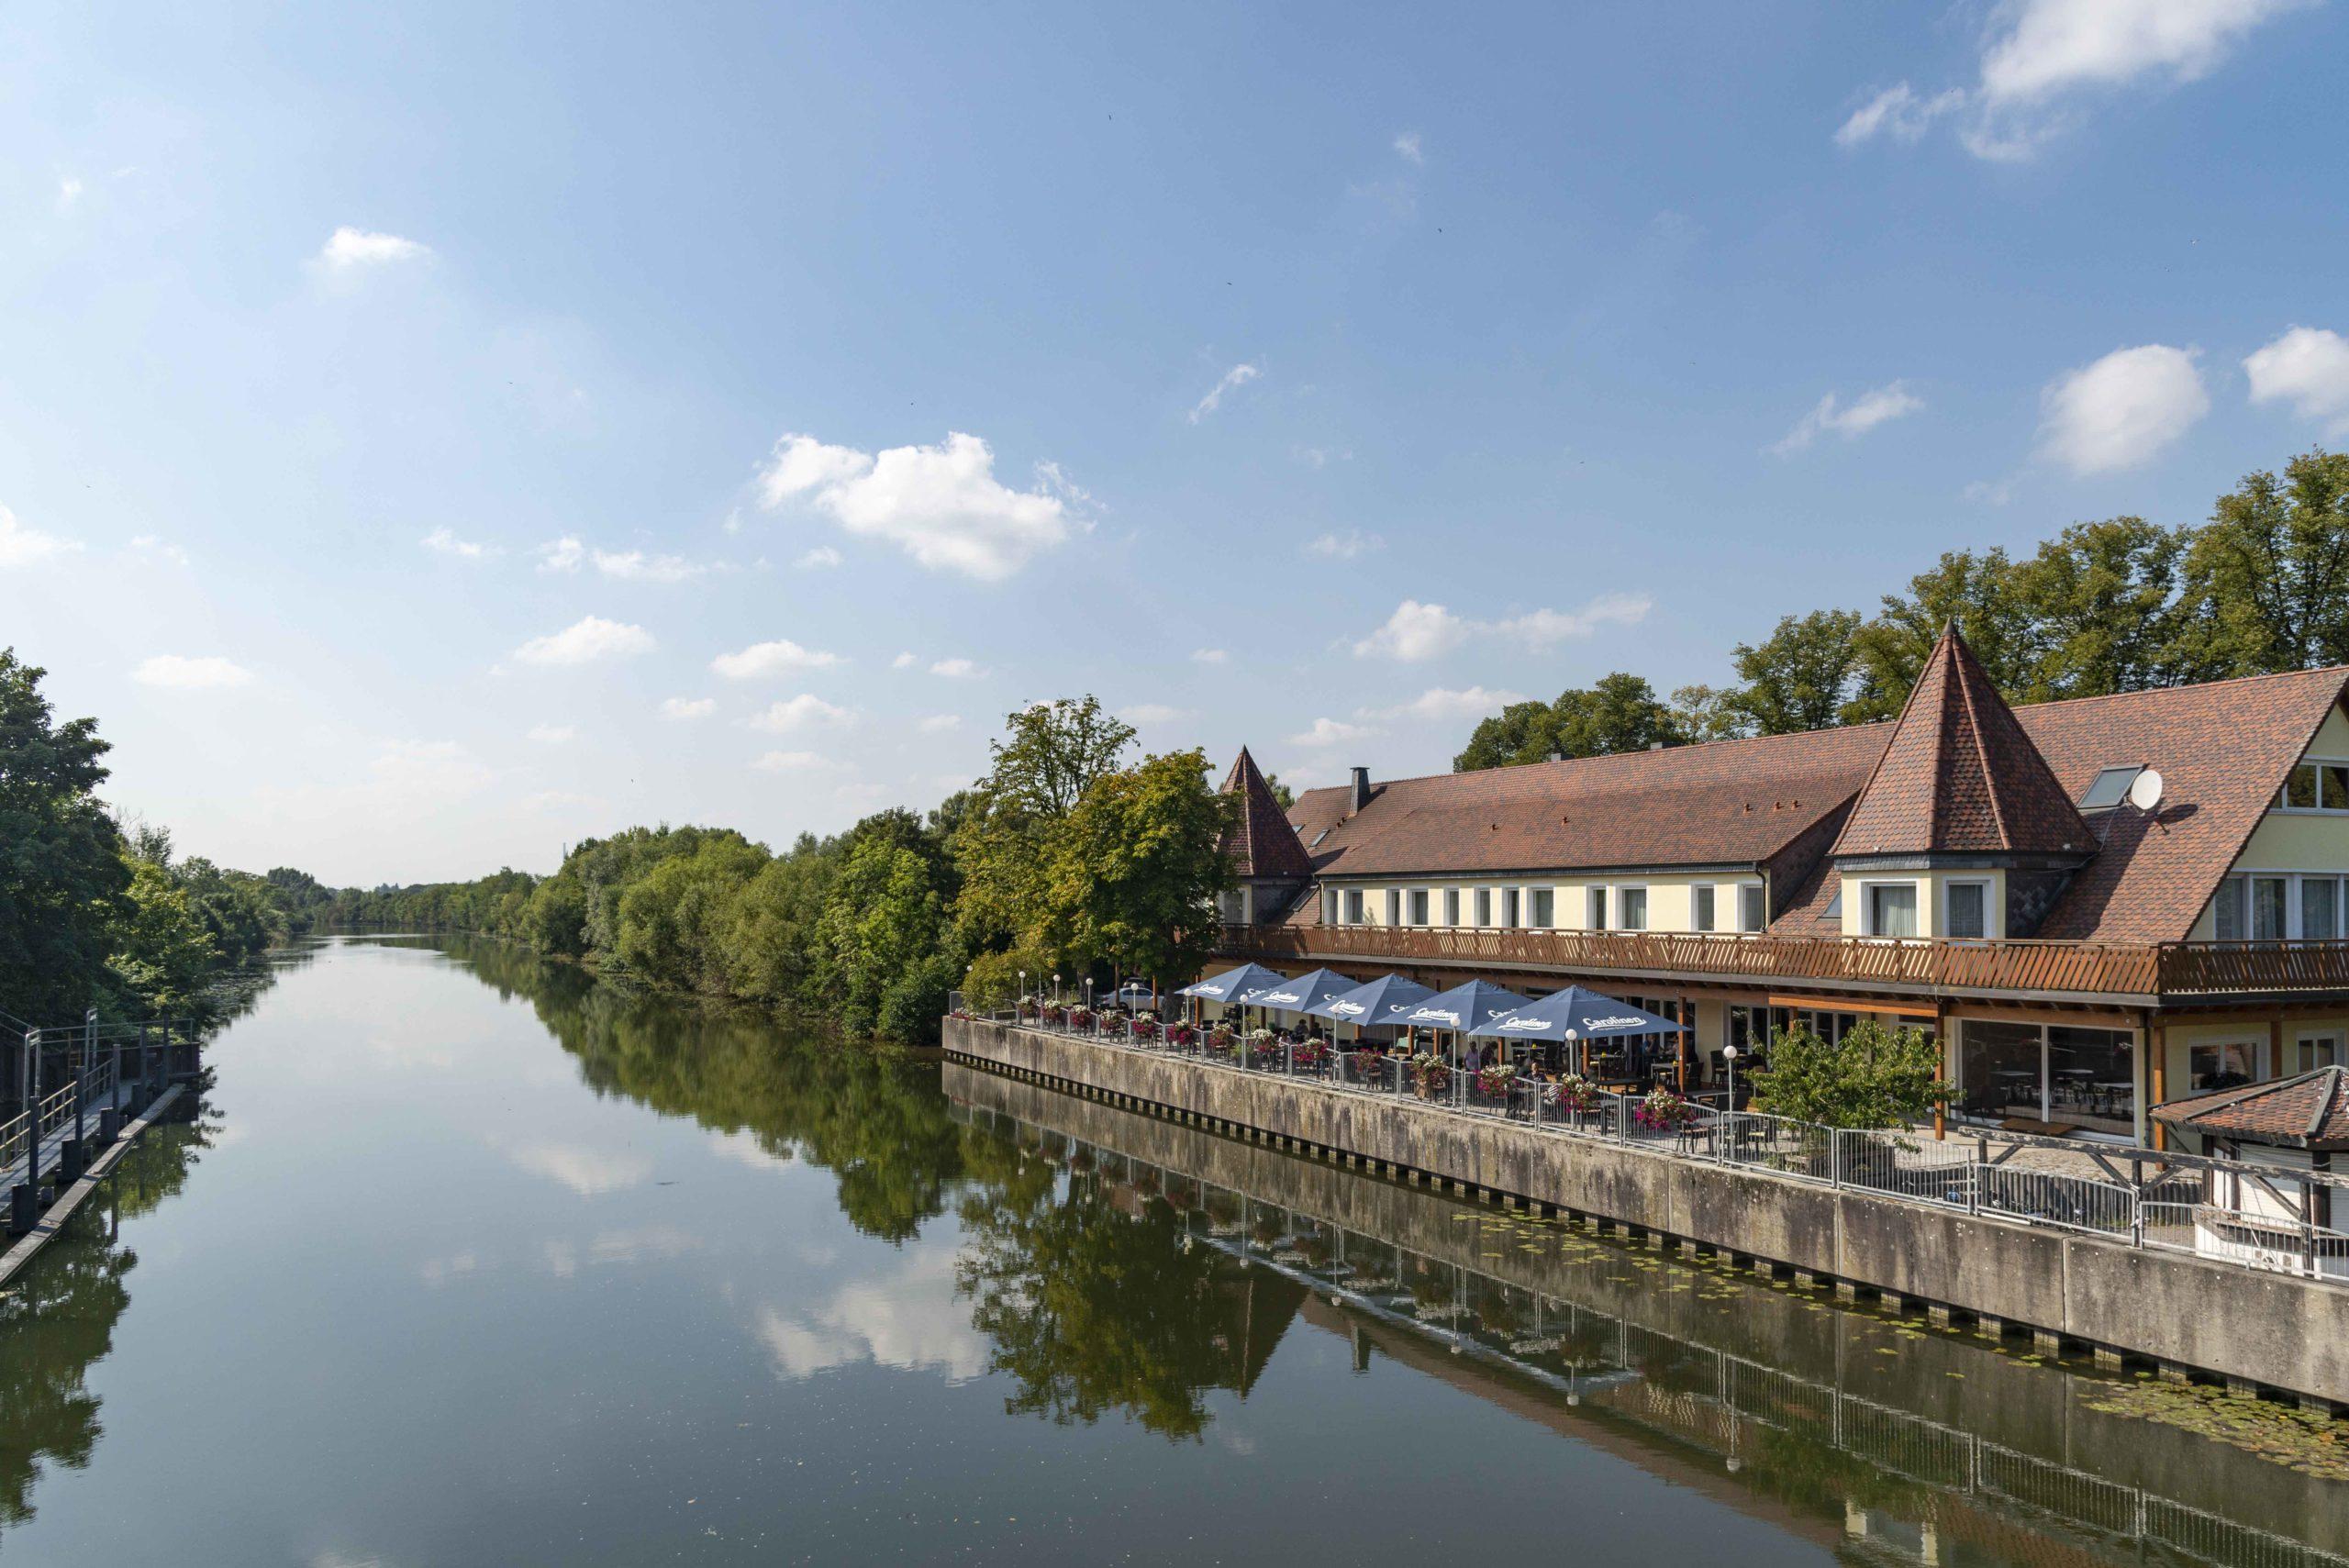 Hamm-Datteln Kanal